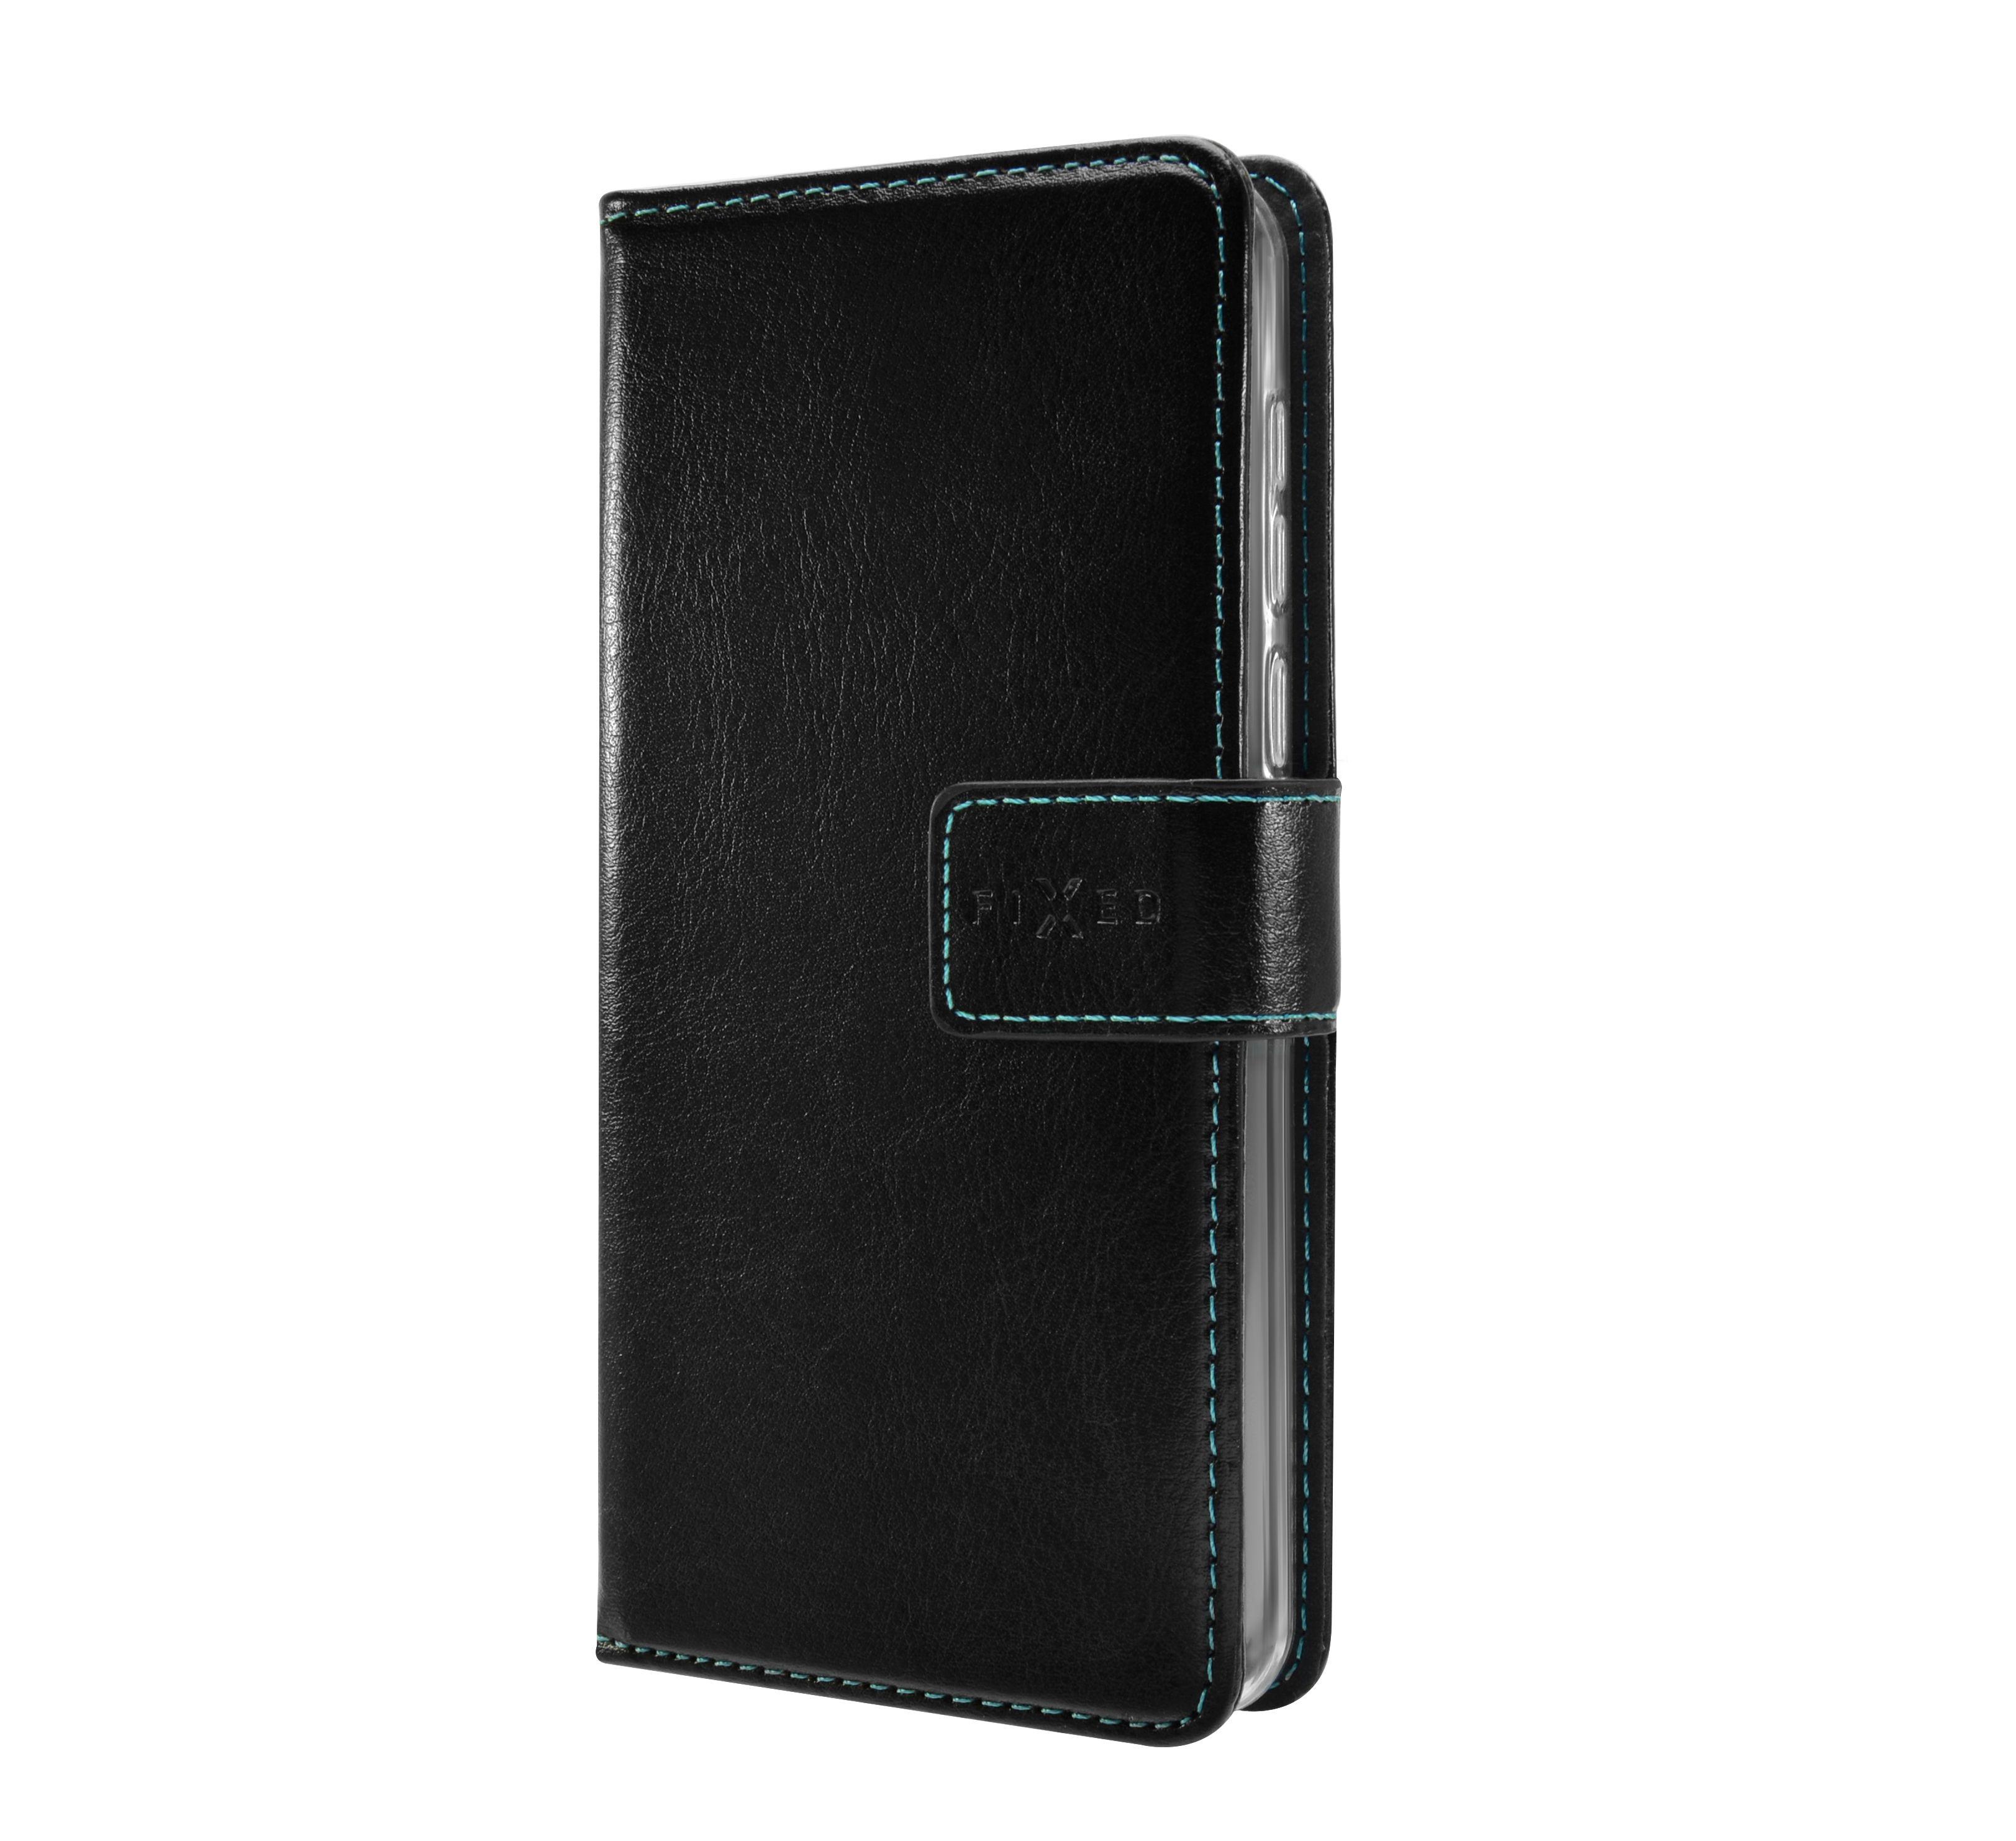 Pouzdro typu kniha FIXED Opus pro Motorola One Vision, černé